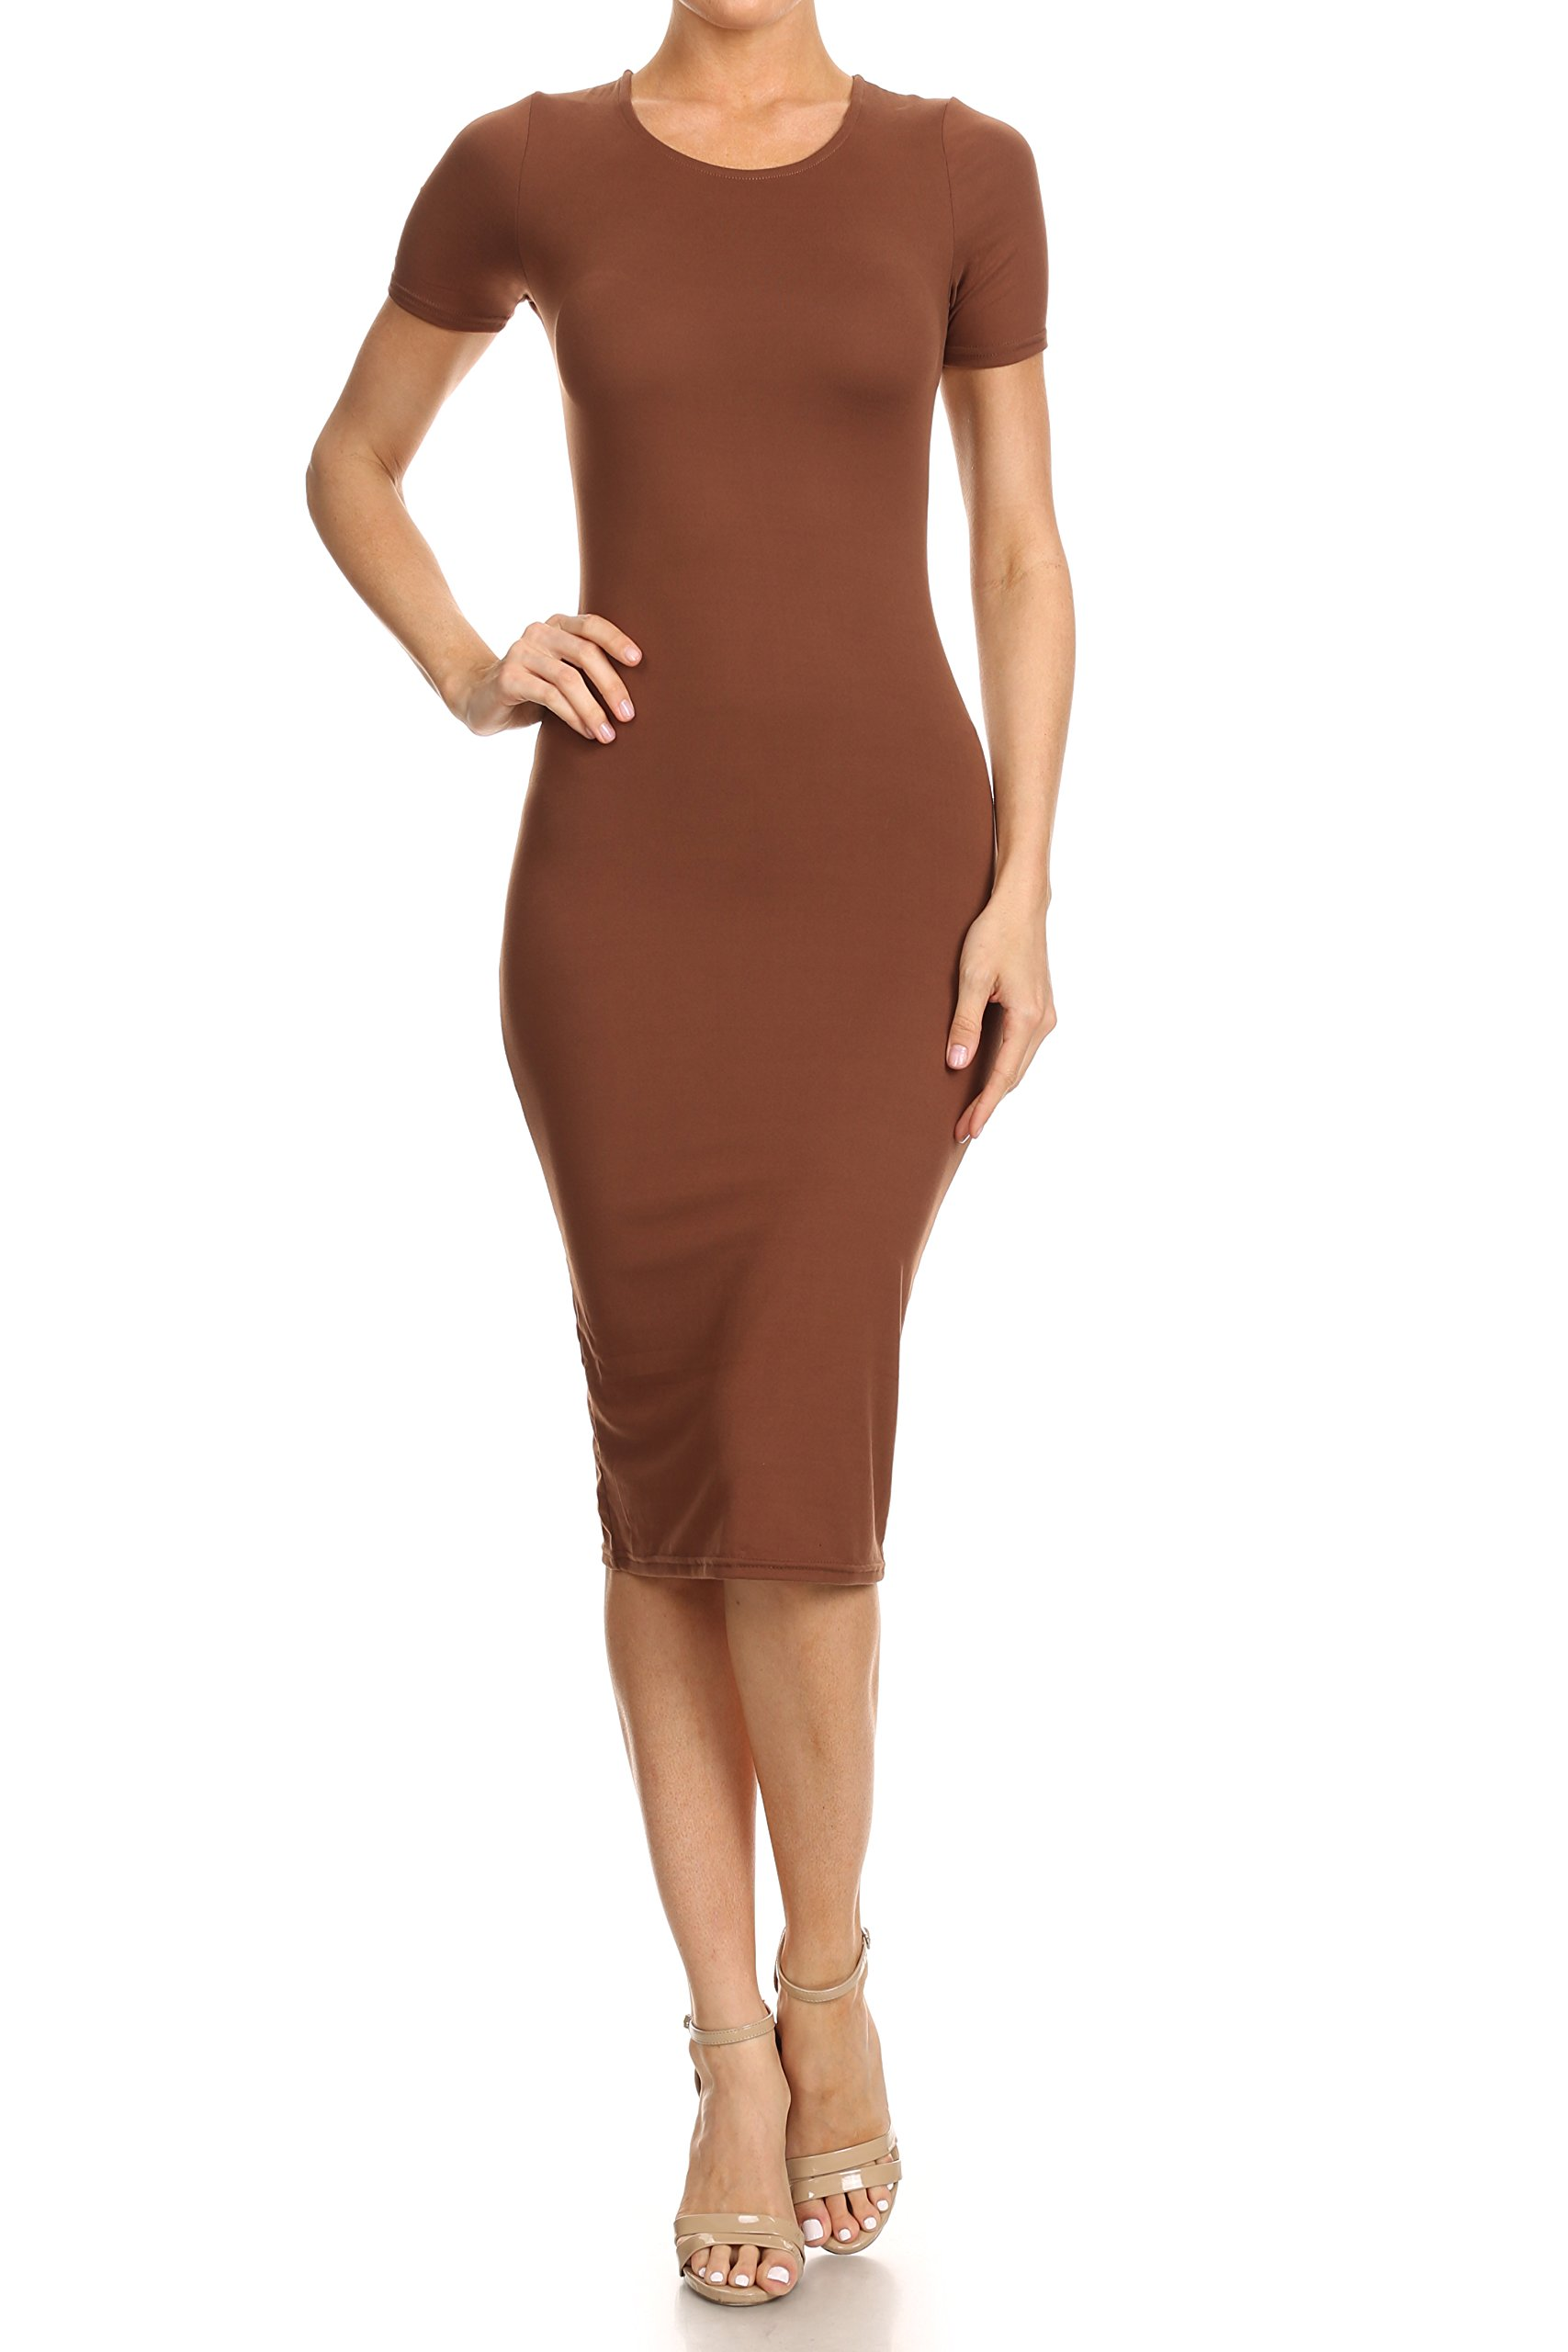 Women Ladies Cap Sleeve Midi Dress Jersey Stretch Crew Neck Bodycon Plus Size